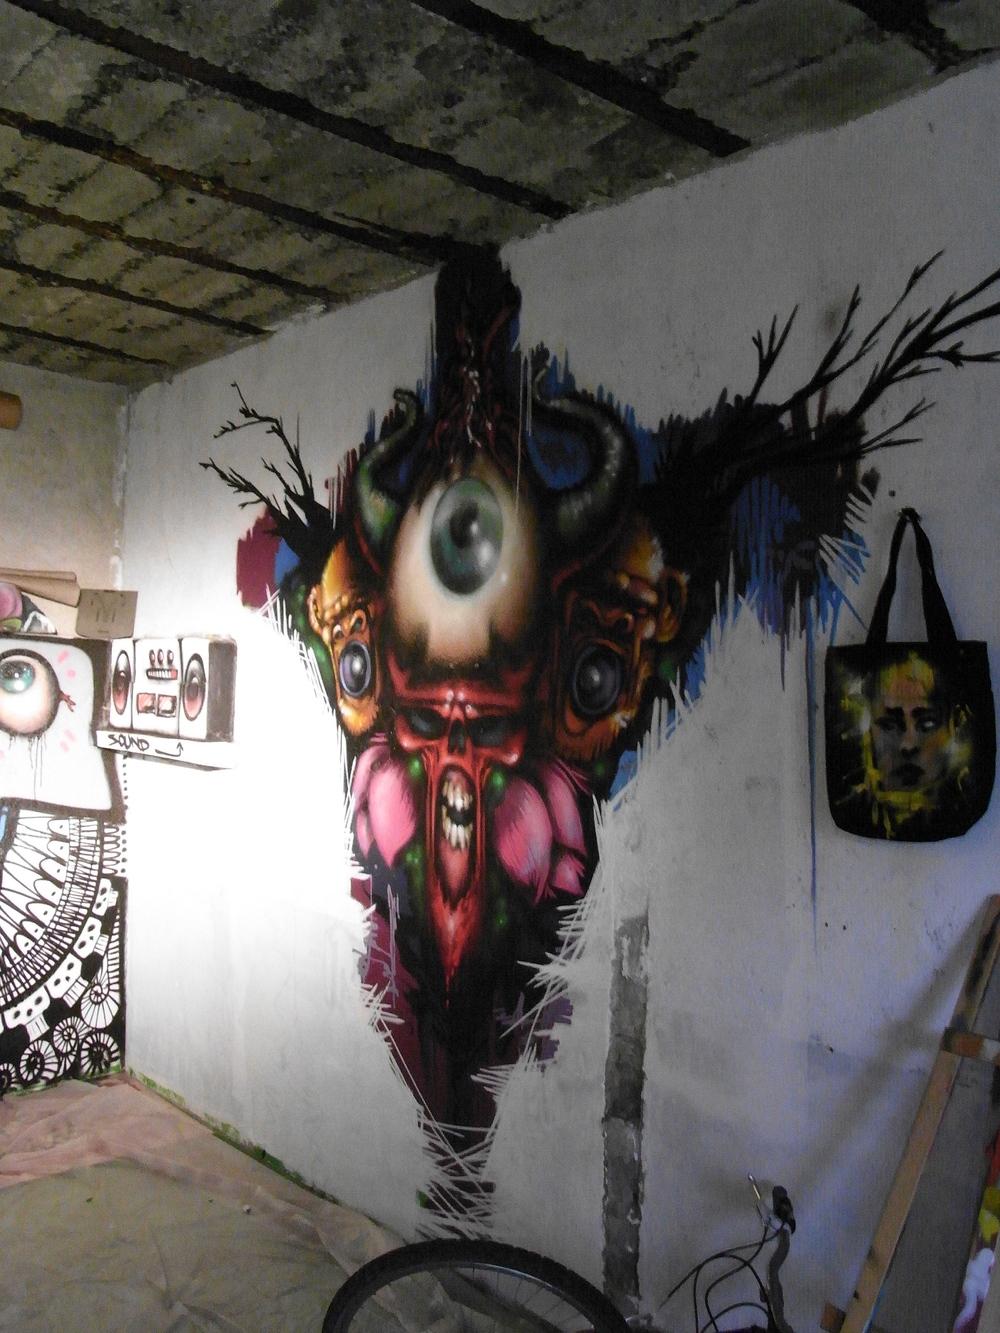 Août 2010 - Atelier Rochecorbon